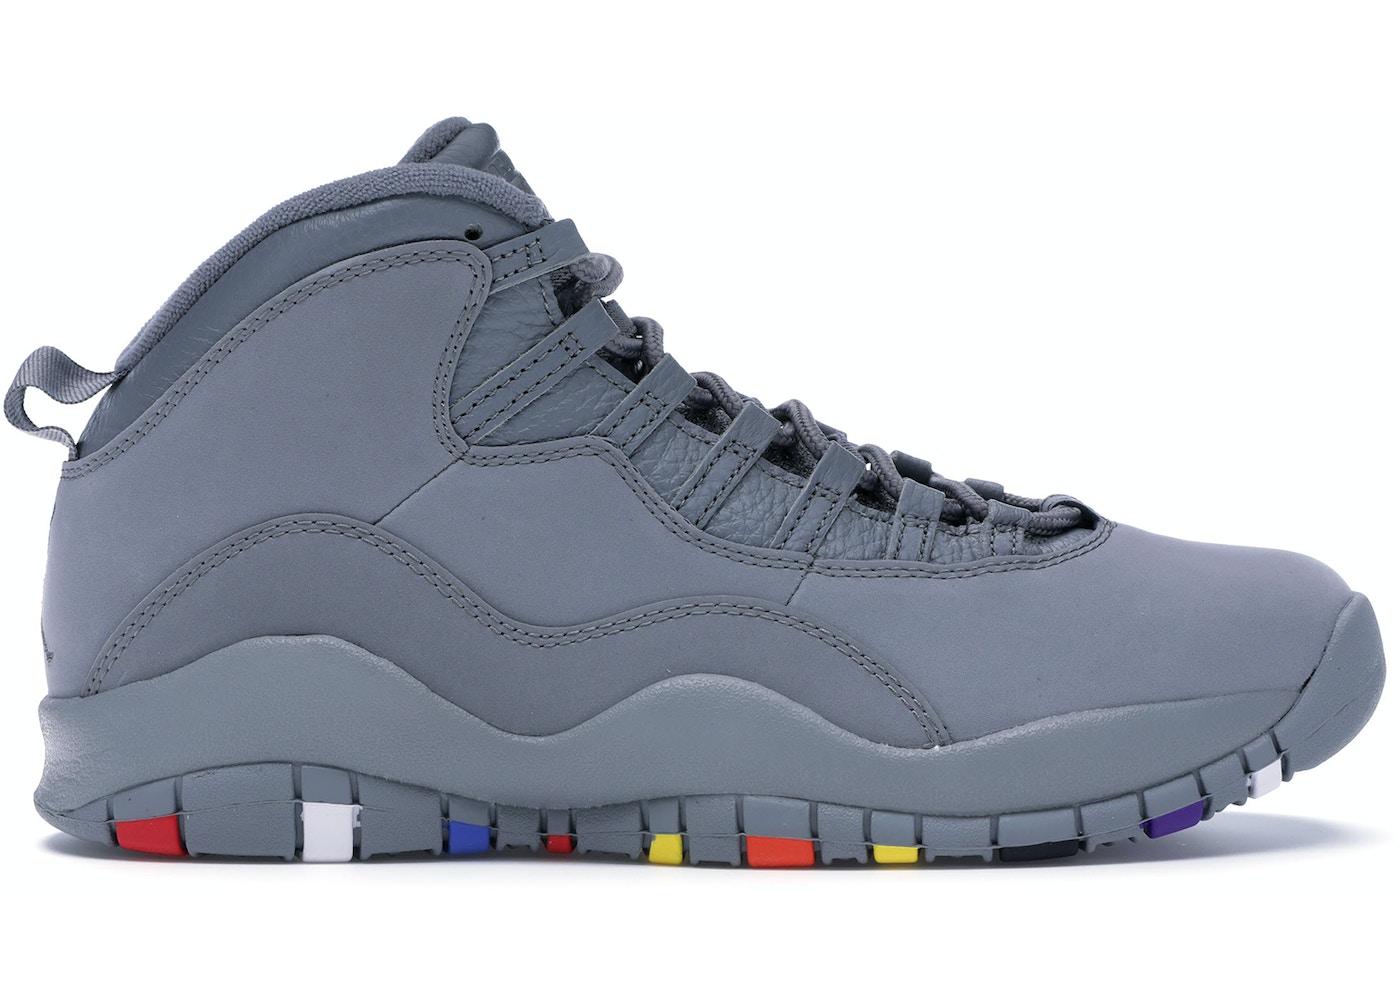 ac8fc3d5bfe6 Buy Air Jordan 10 Shoes   Deadstock Sneakers